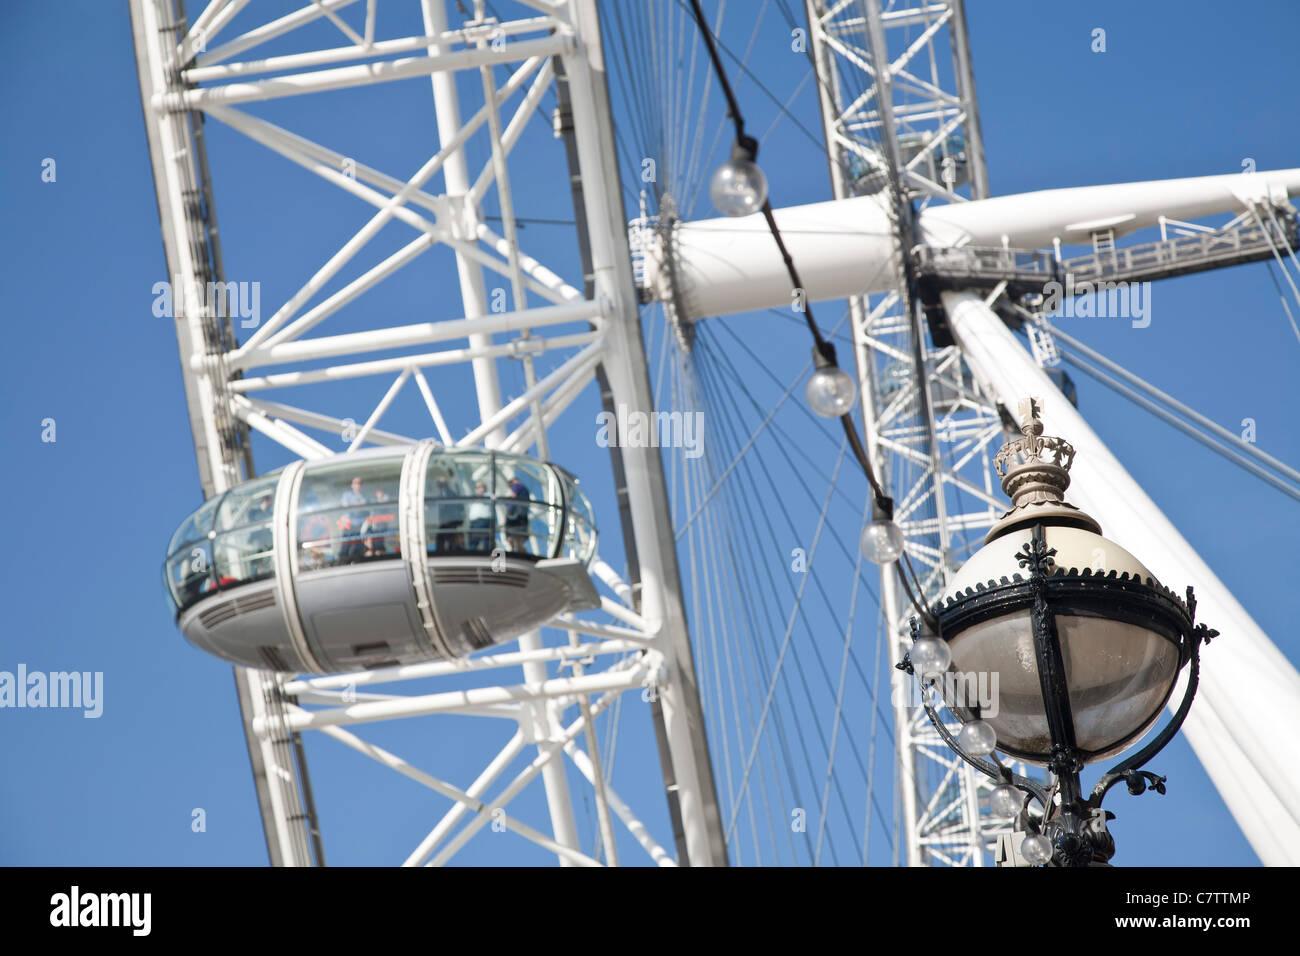 Passagier-Kapsel mit dem London Eye, dem Millennium Wheel Stockbild